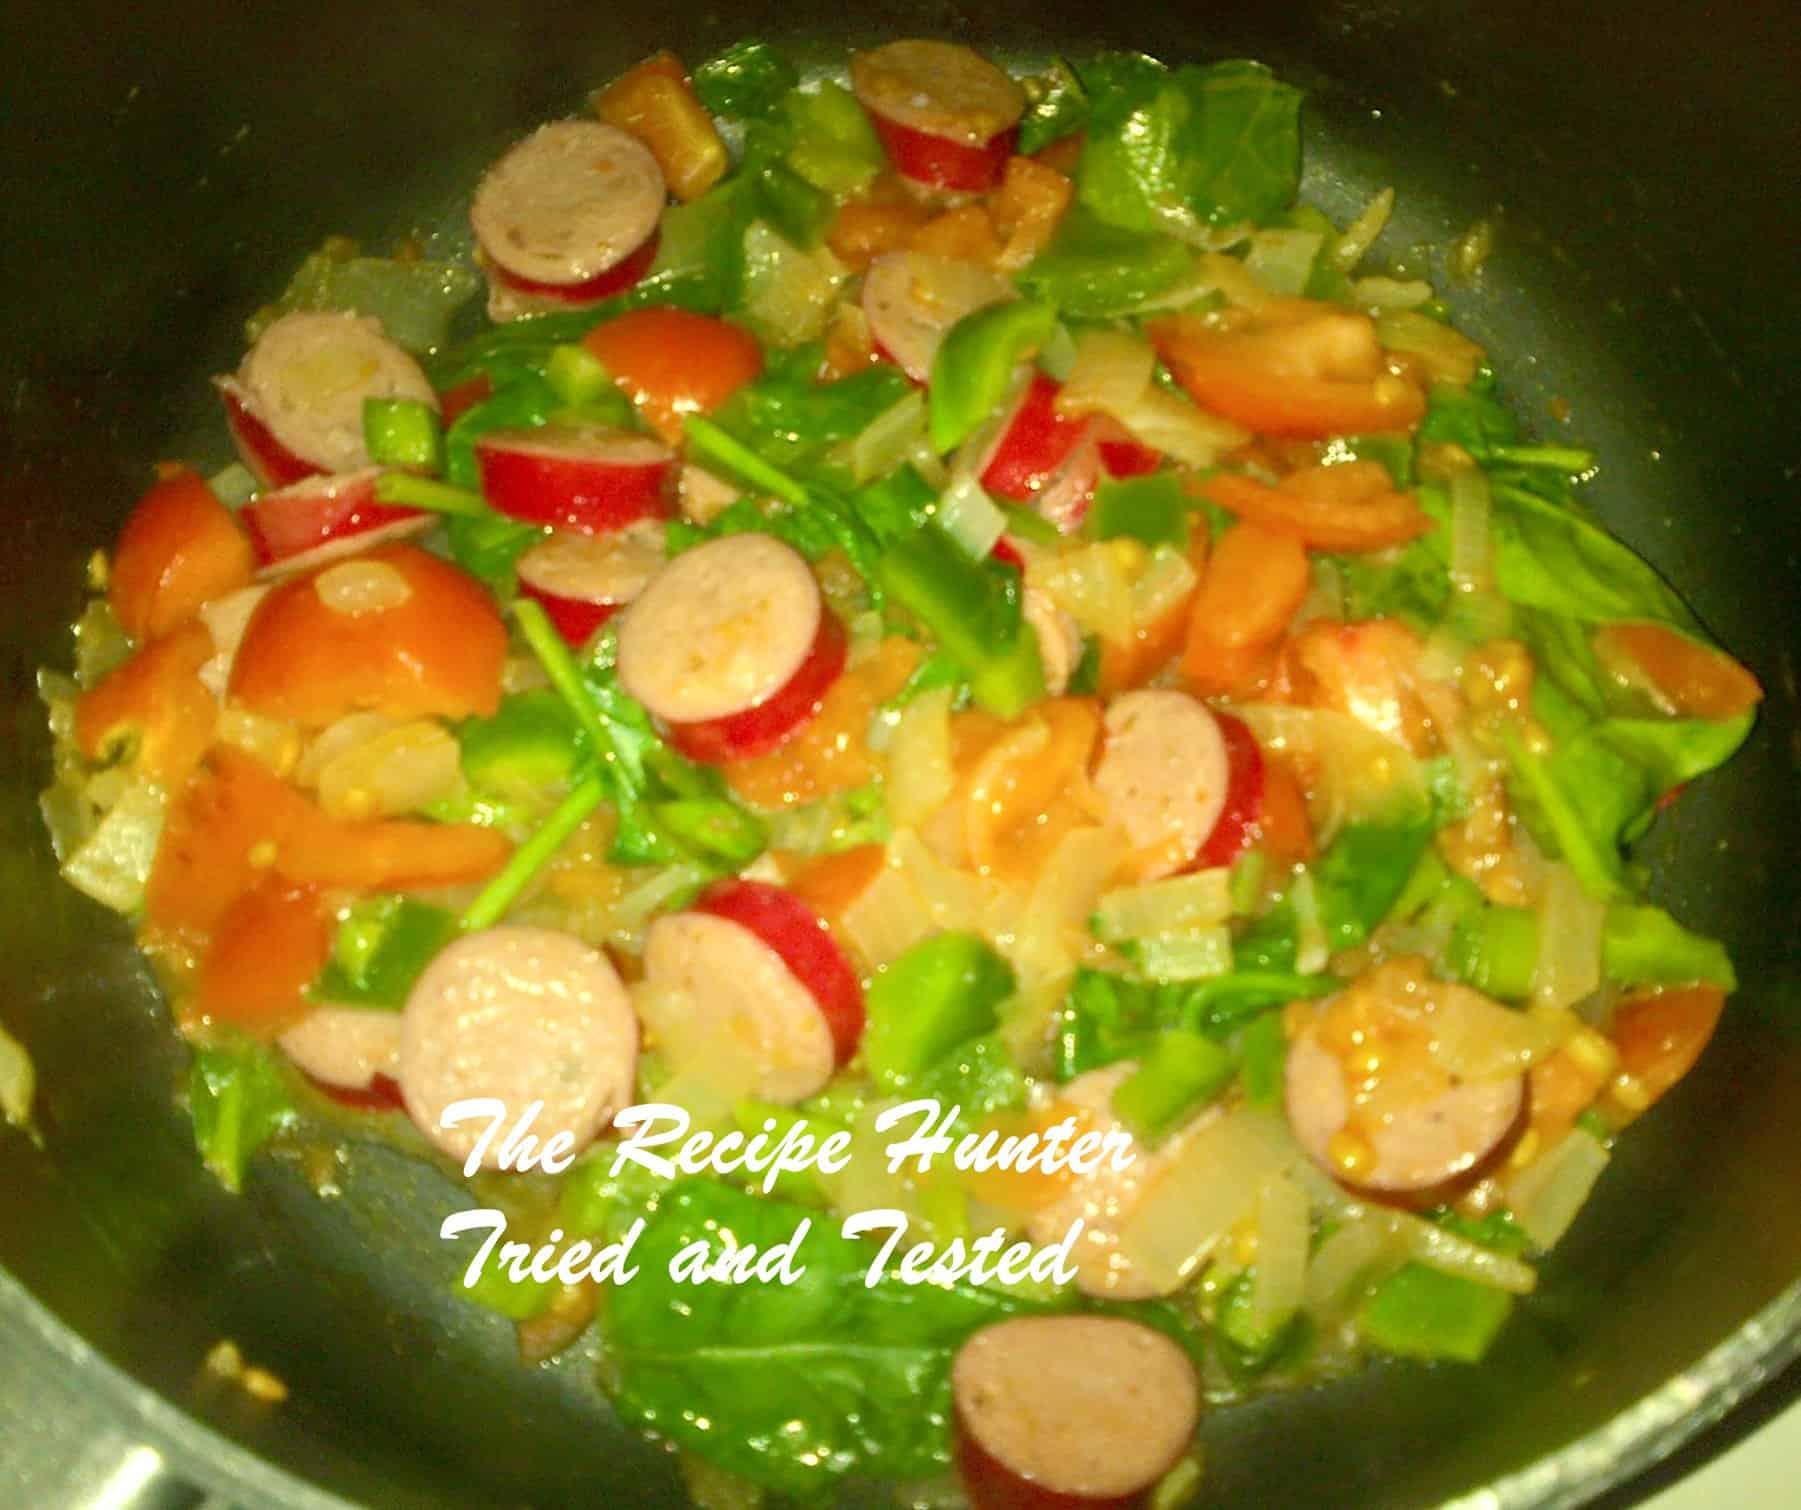 TRH Nazley's Saute Vienna's & Veggie Cheesy wrap2